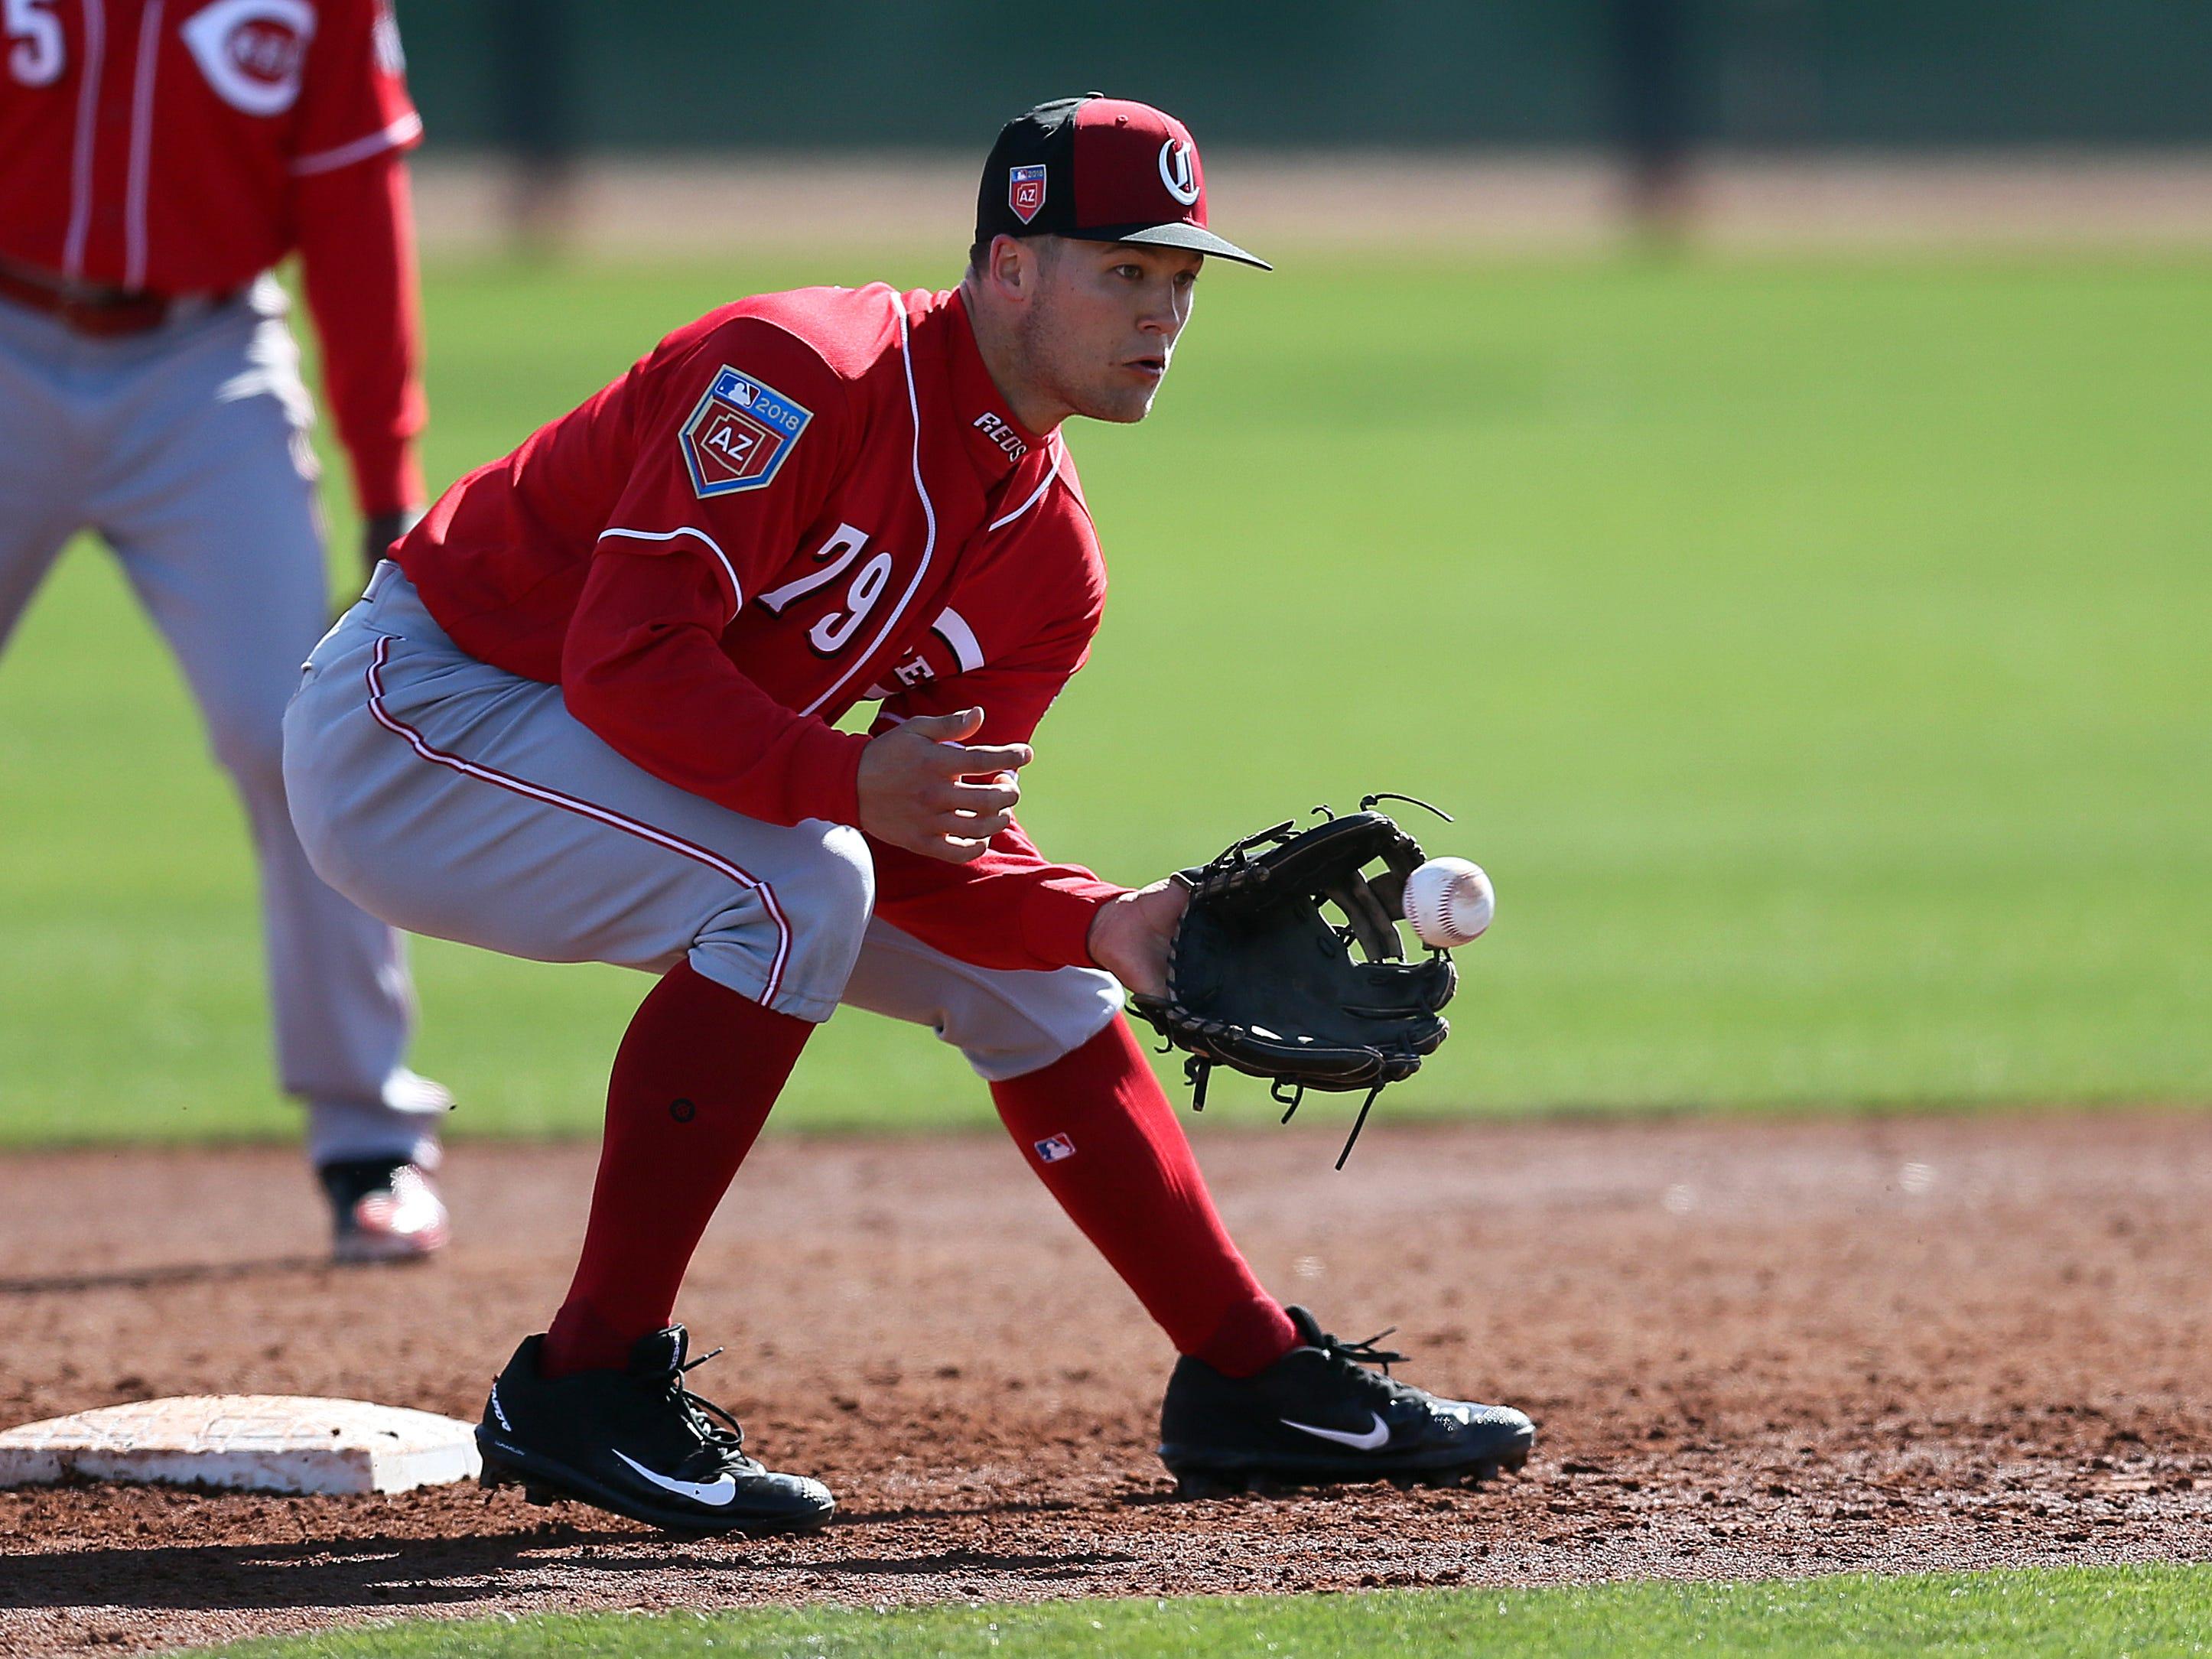 18. Nick Senzel, 2B-3B, Reds